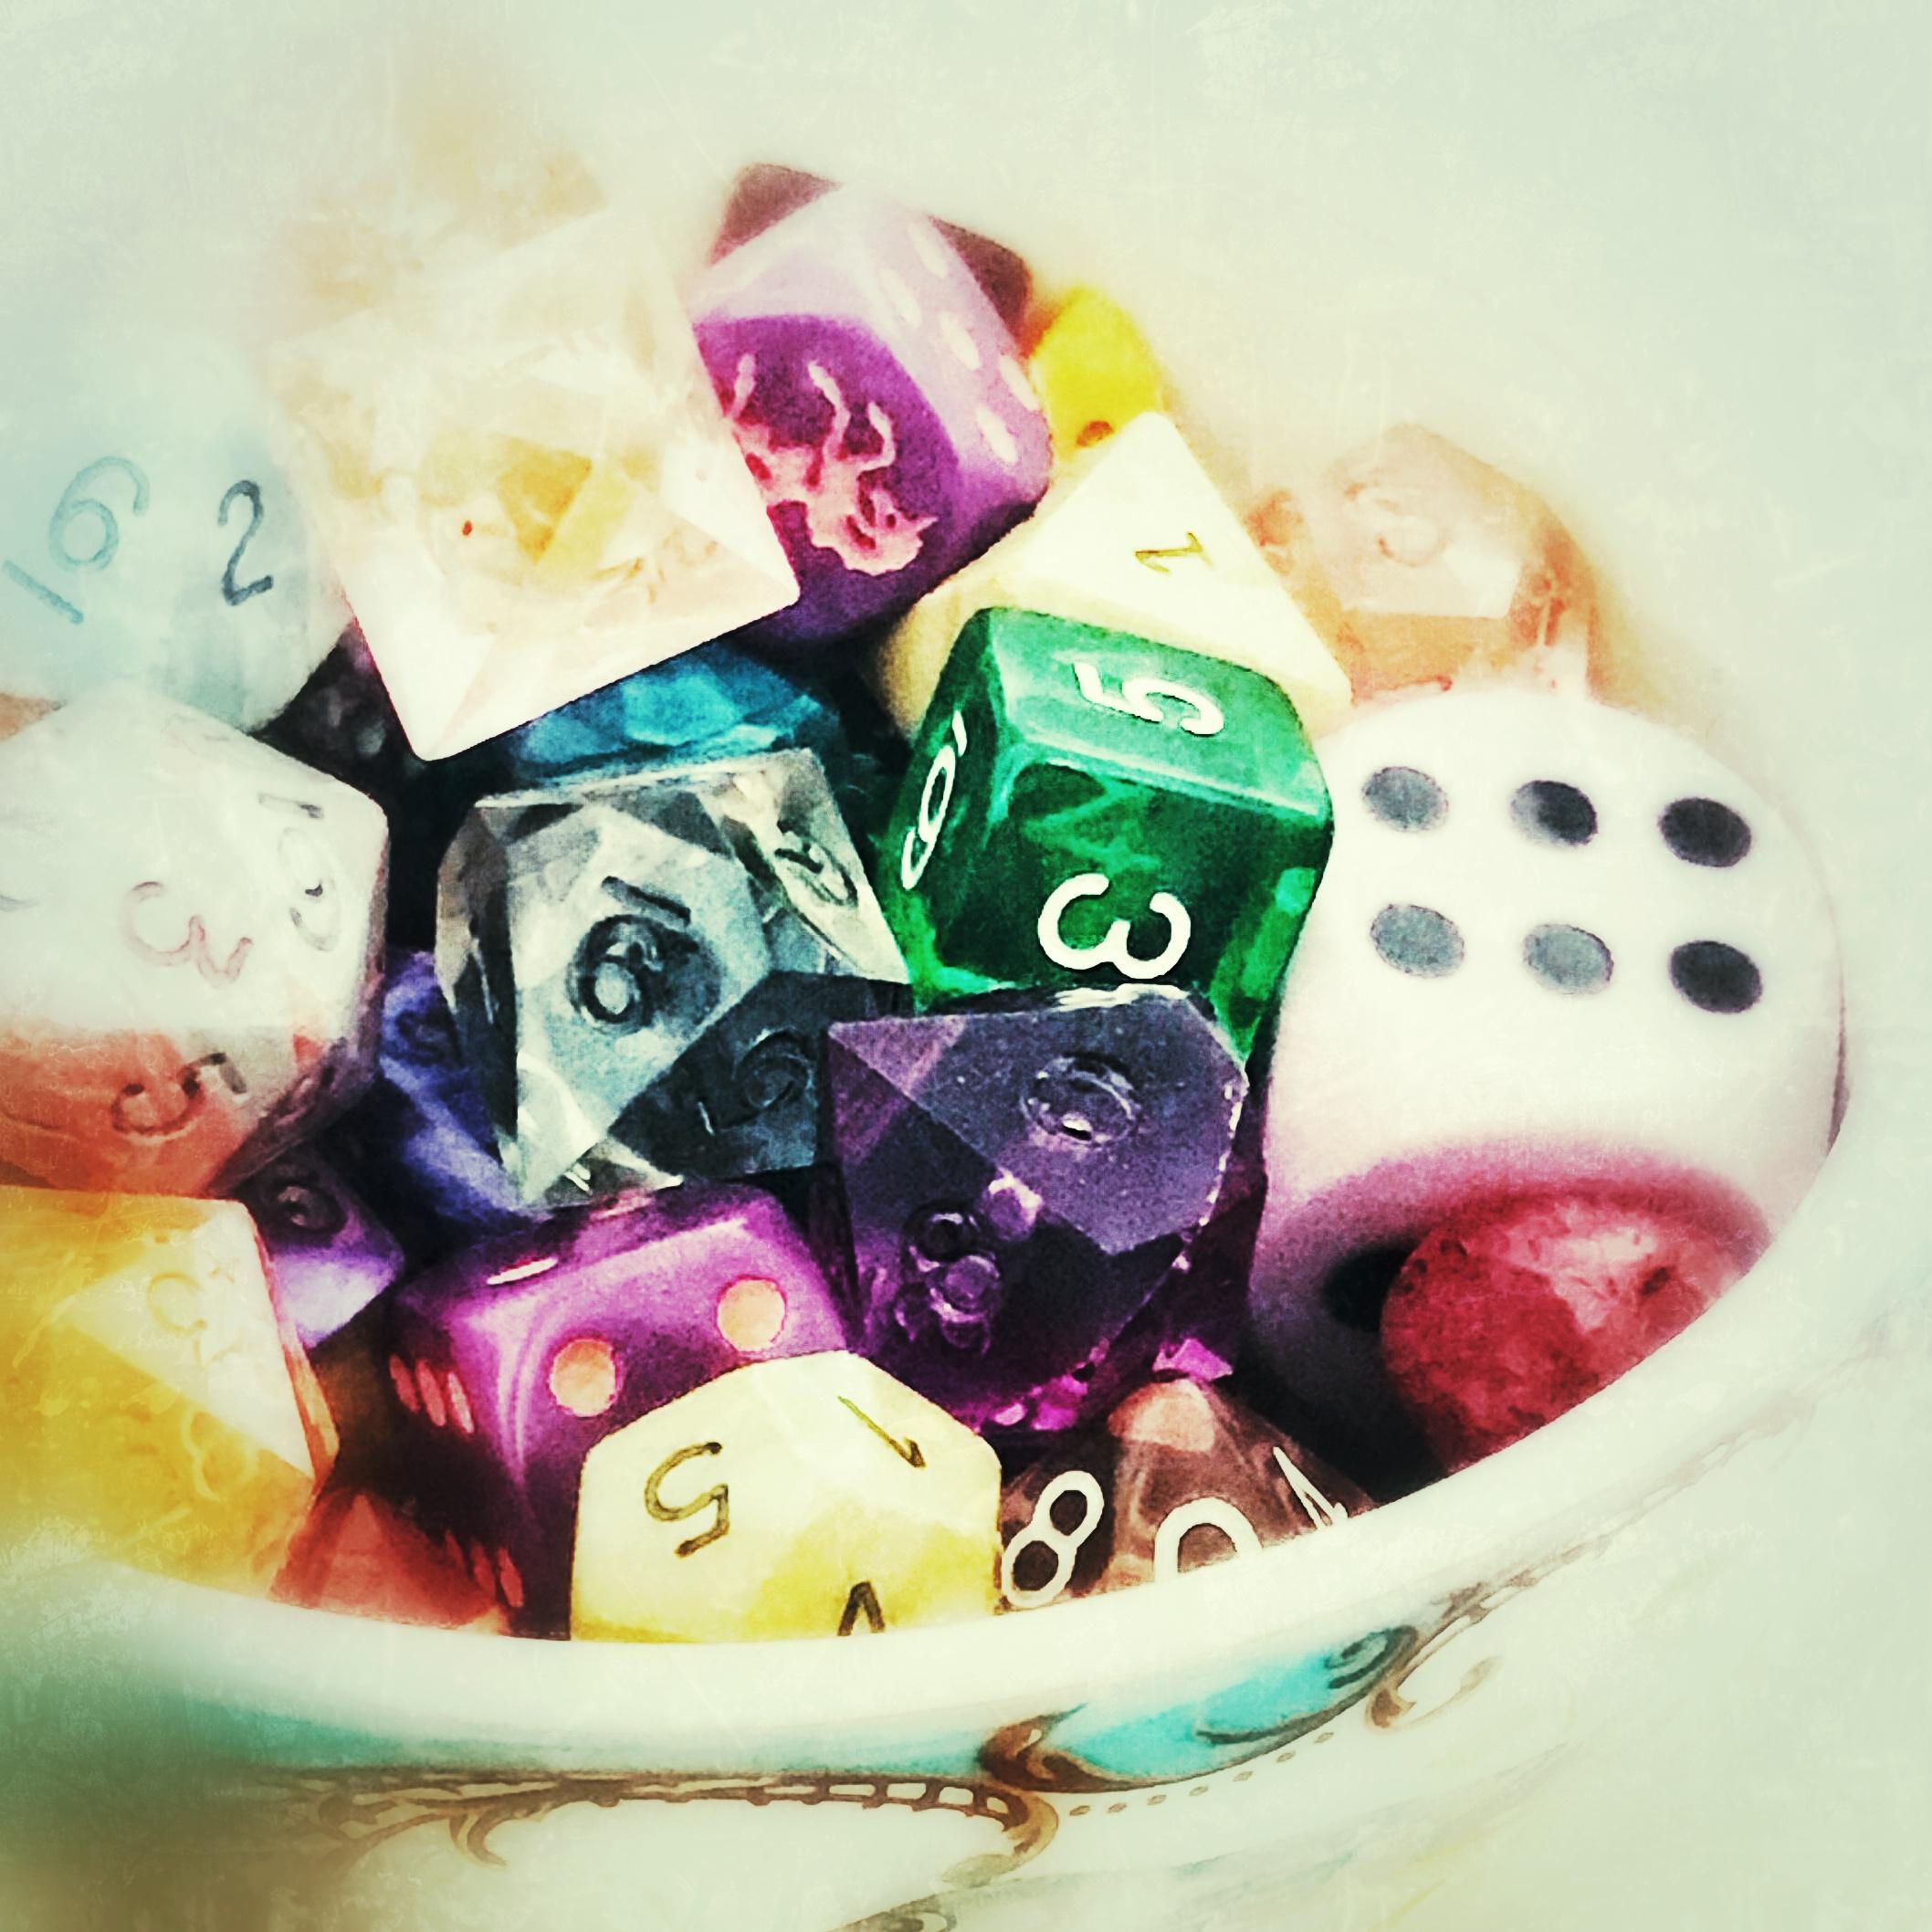 bowl of colorful RPG Dice